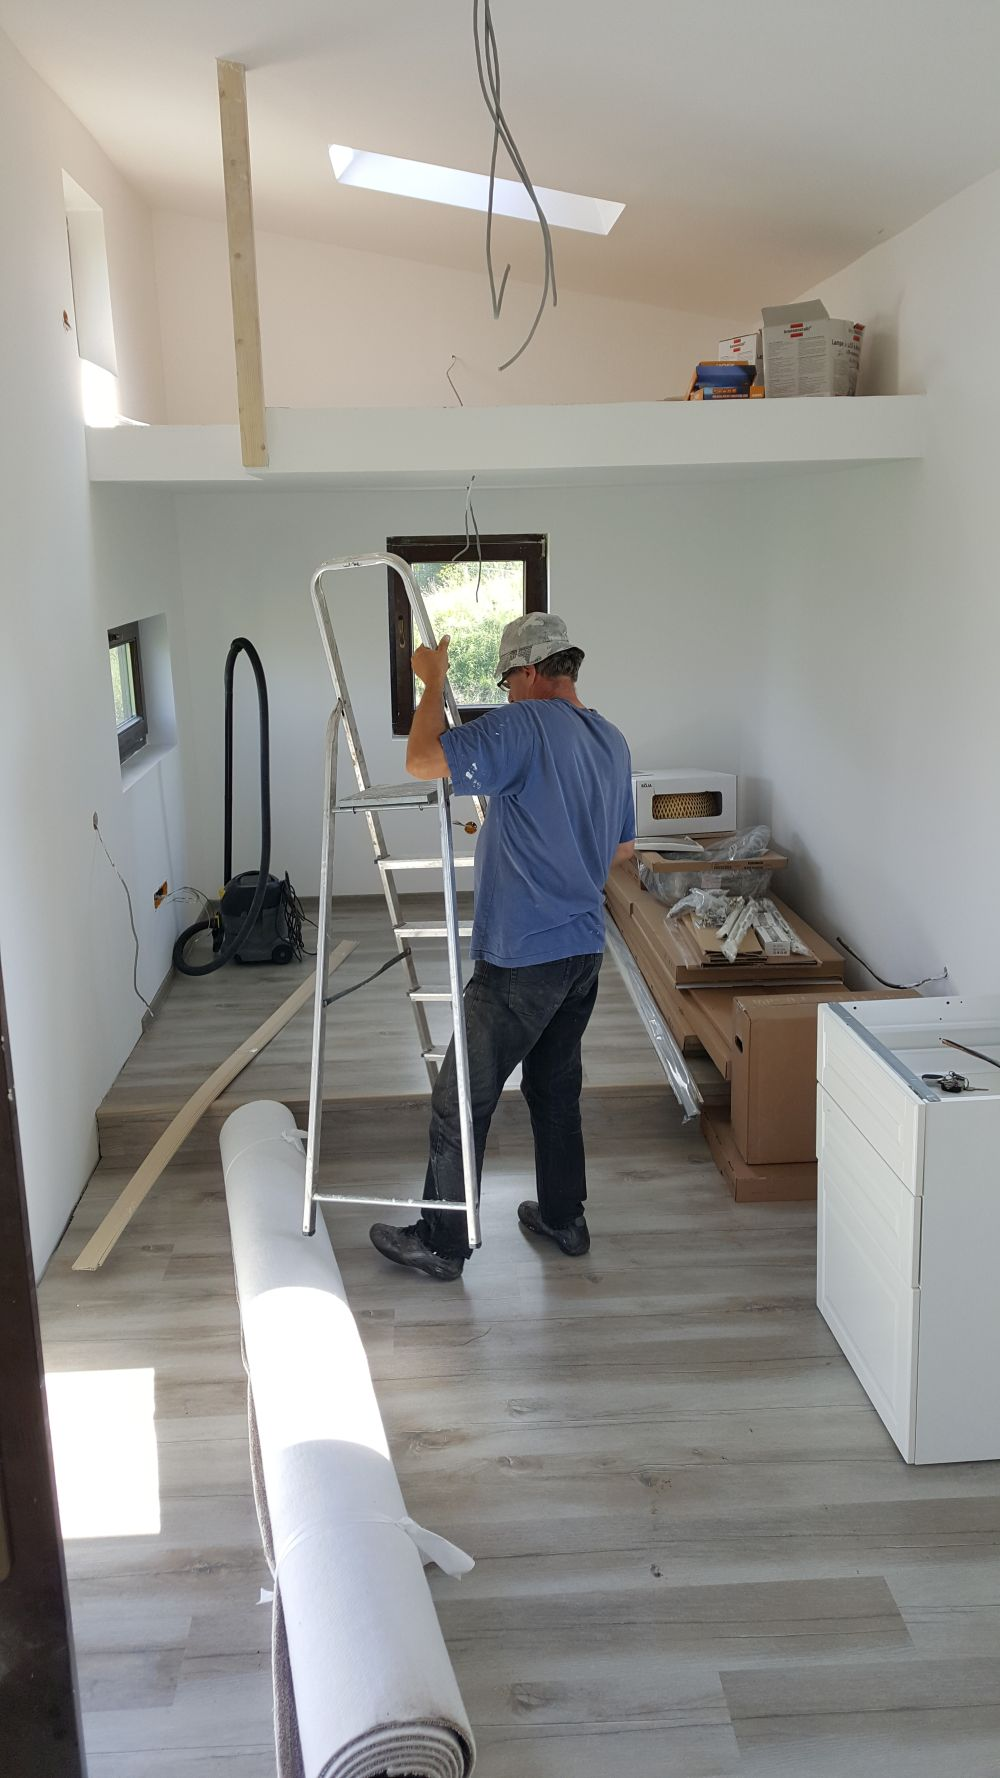 adelaparvu-com-despre-tiny-house-in-miercurea-ciuc-romania-casa-30-mp-desginer-botond-szakacs-foto-biro-zoltan-41